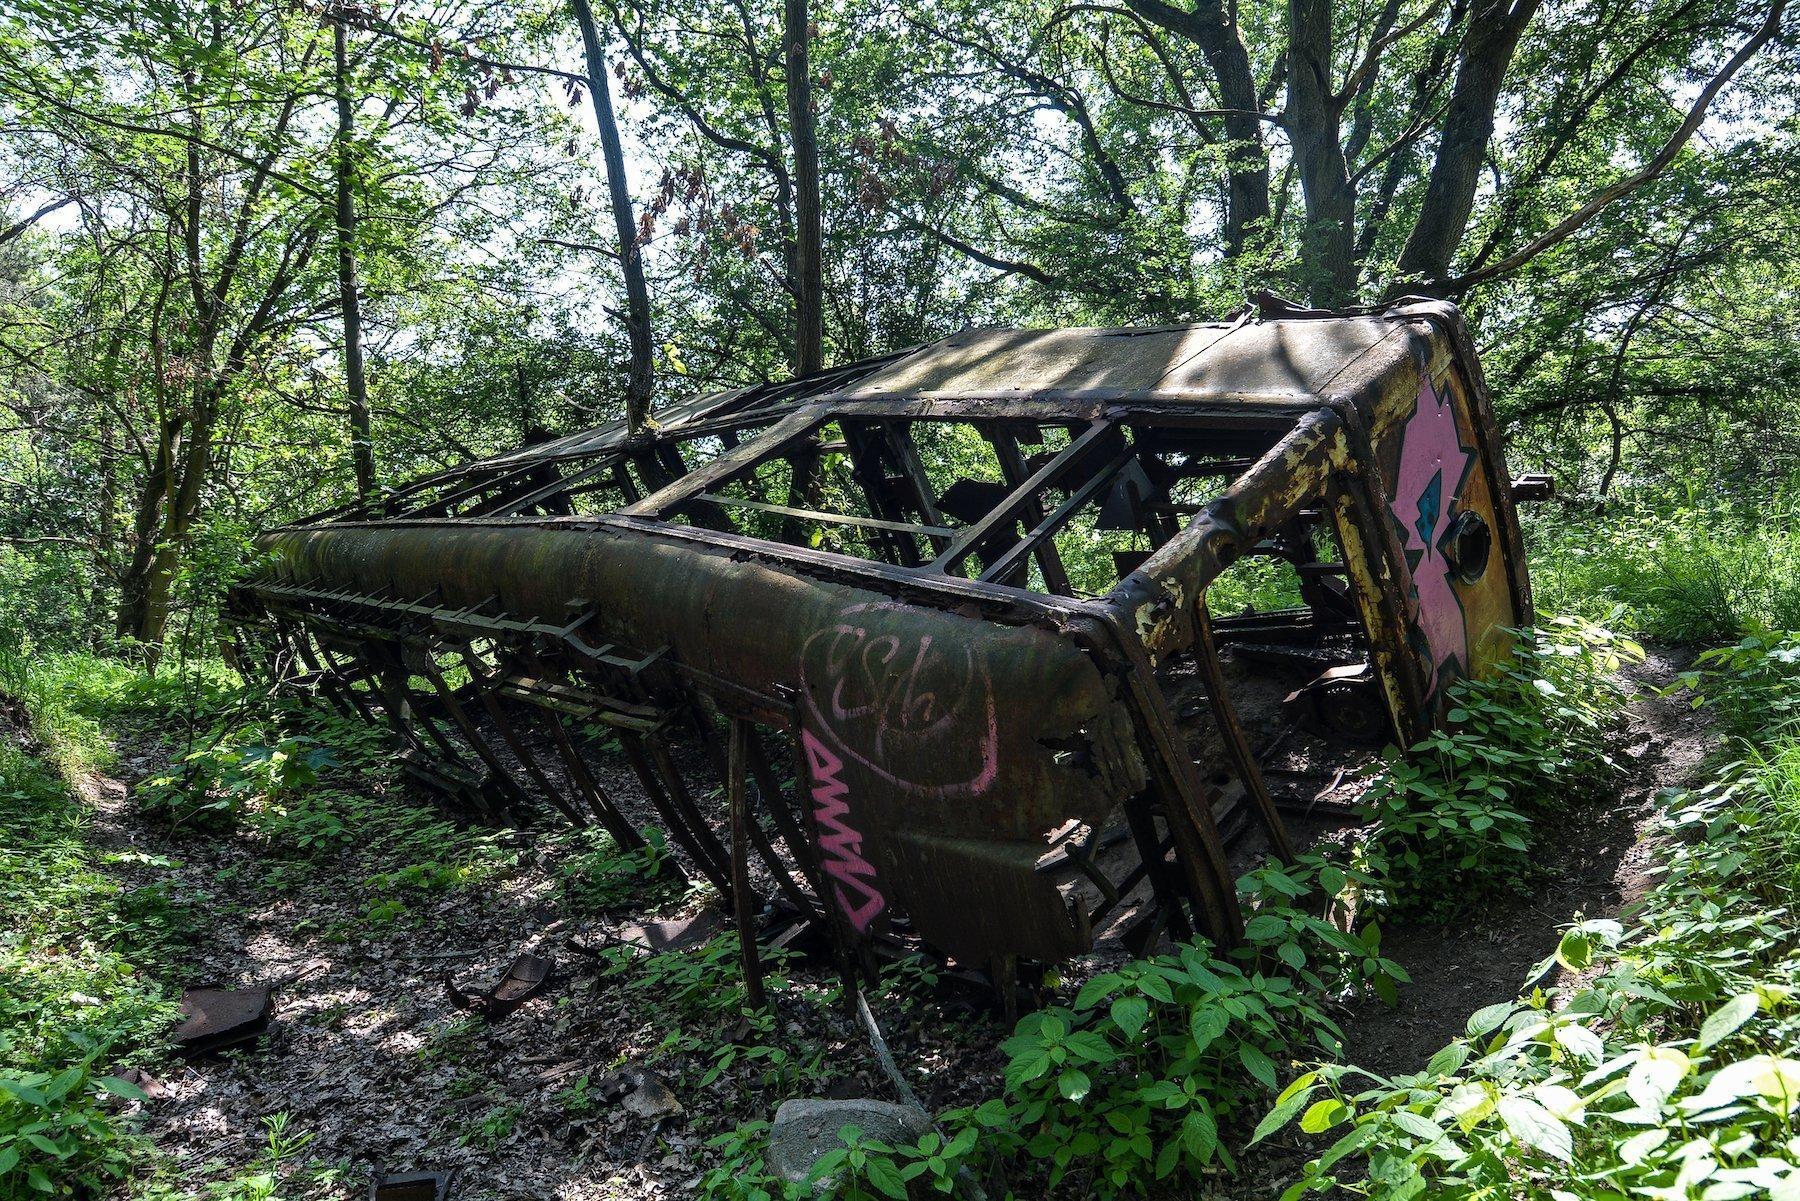 abandoned tram strassenbahn brandenburg dallgow doeberitz potsdam abandoned urbex lost places germany deutschland